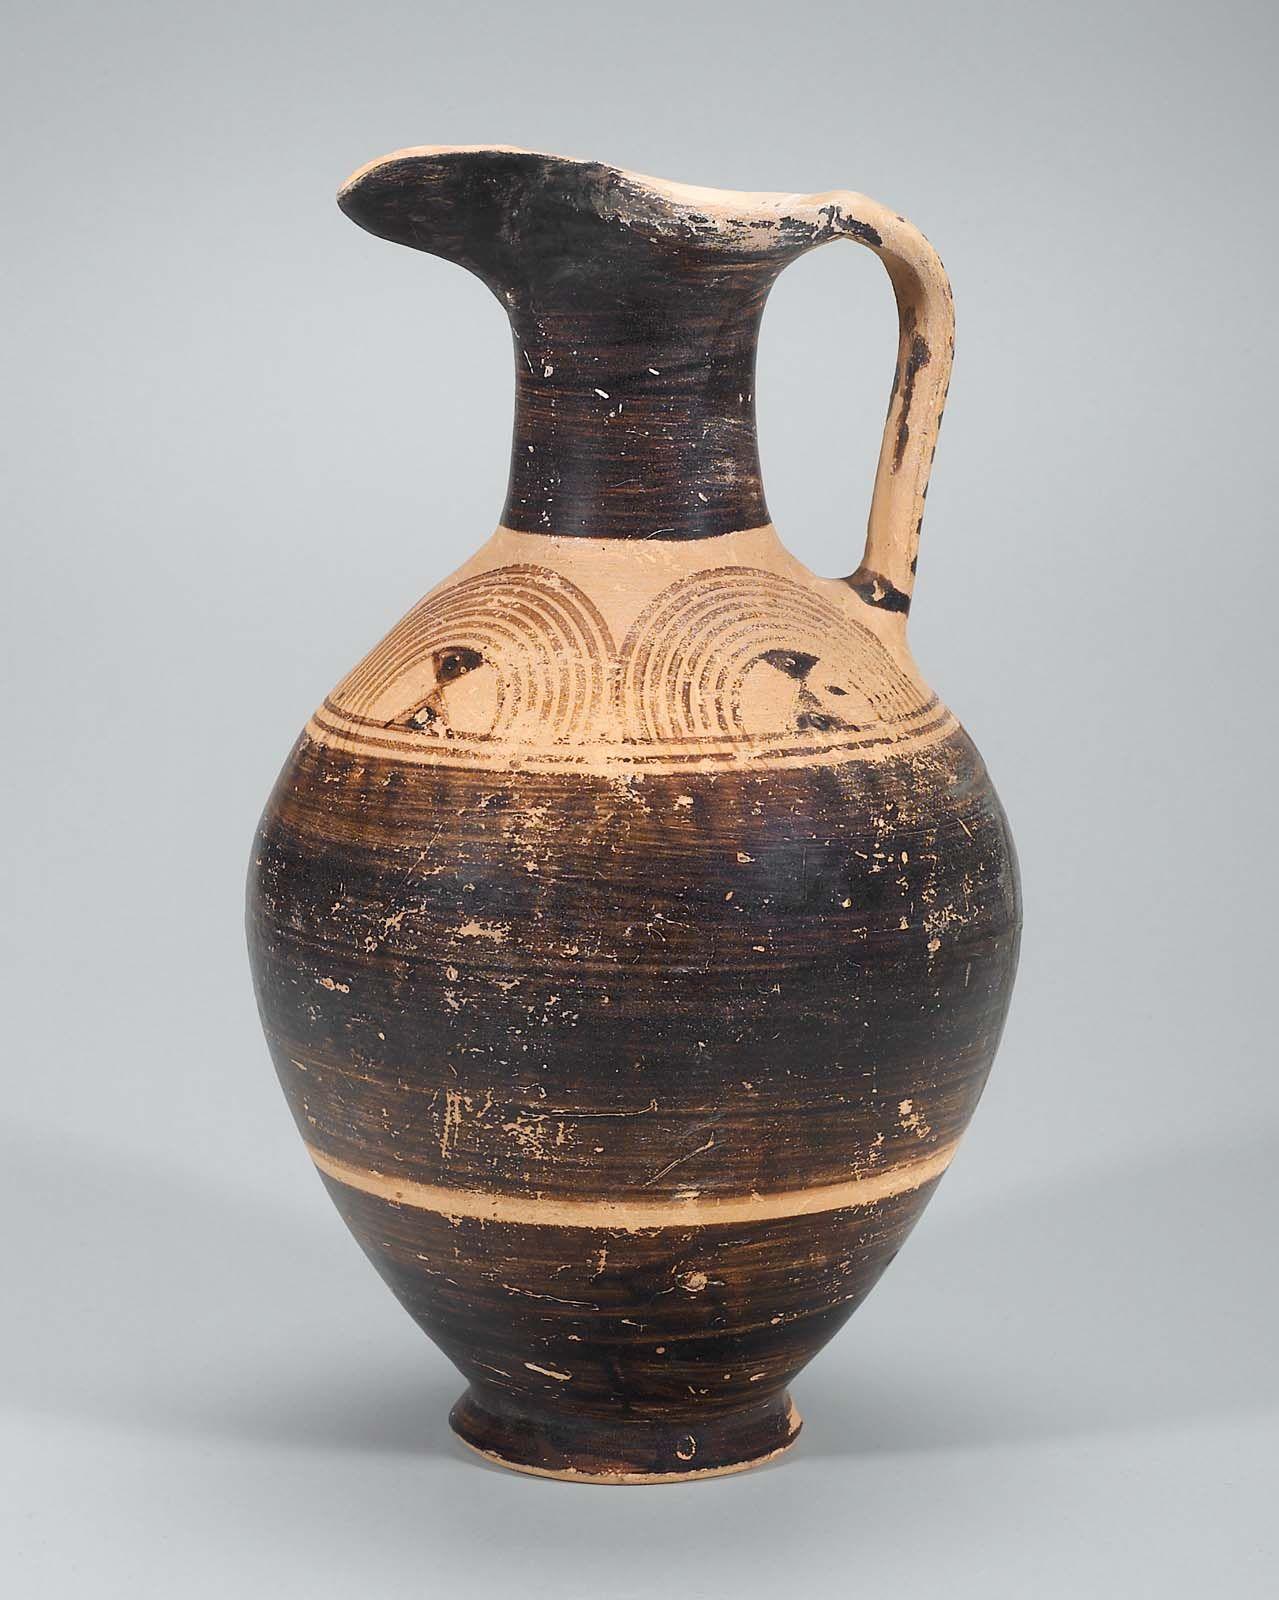 Pitcher Oinochoe Greek Protogeometric Period Abt 900